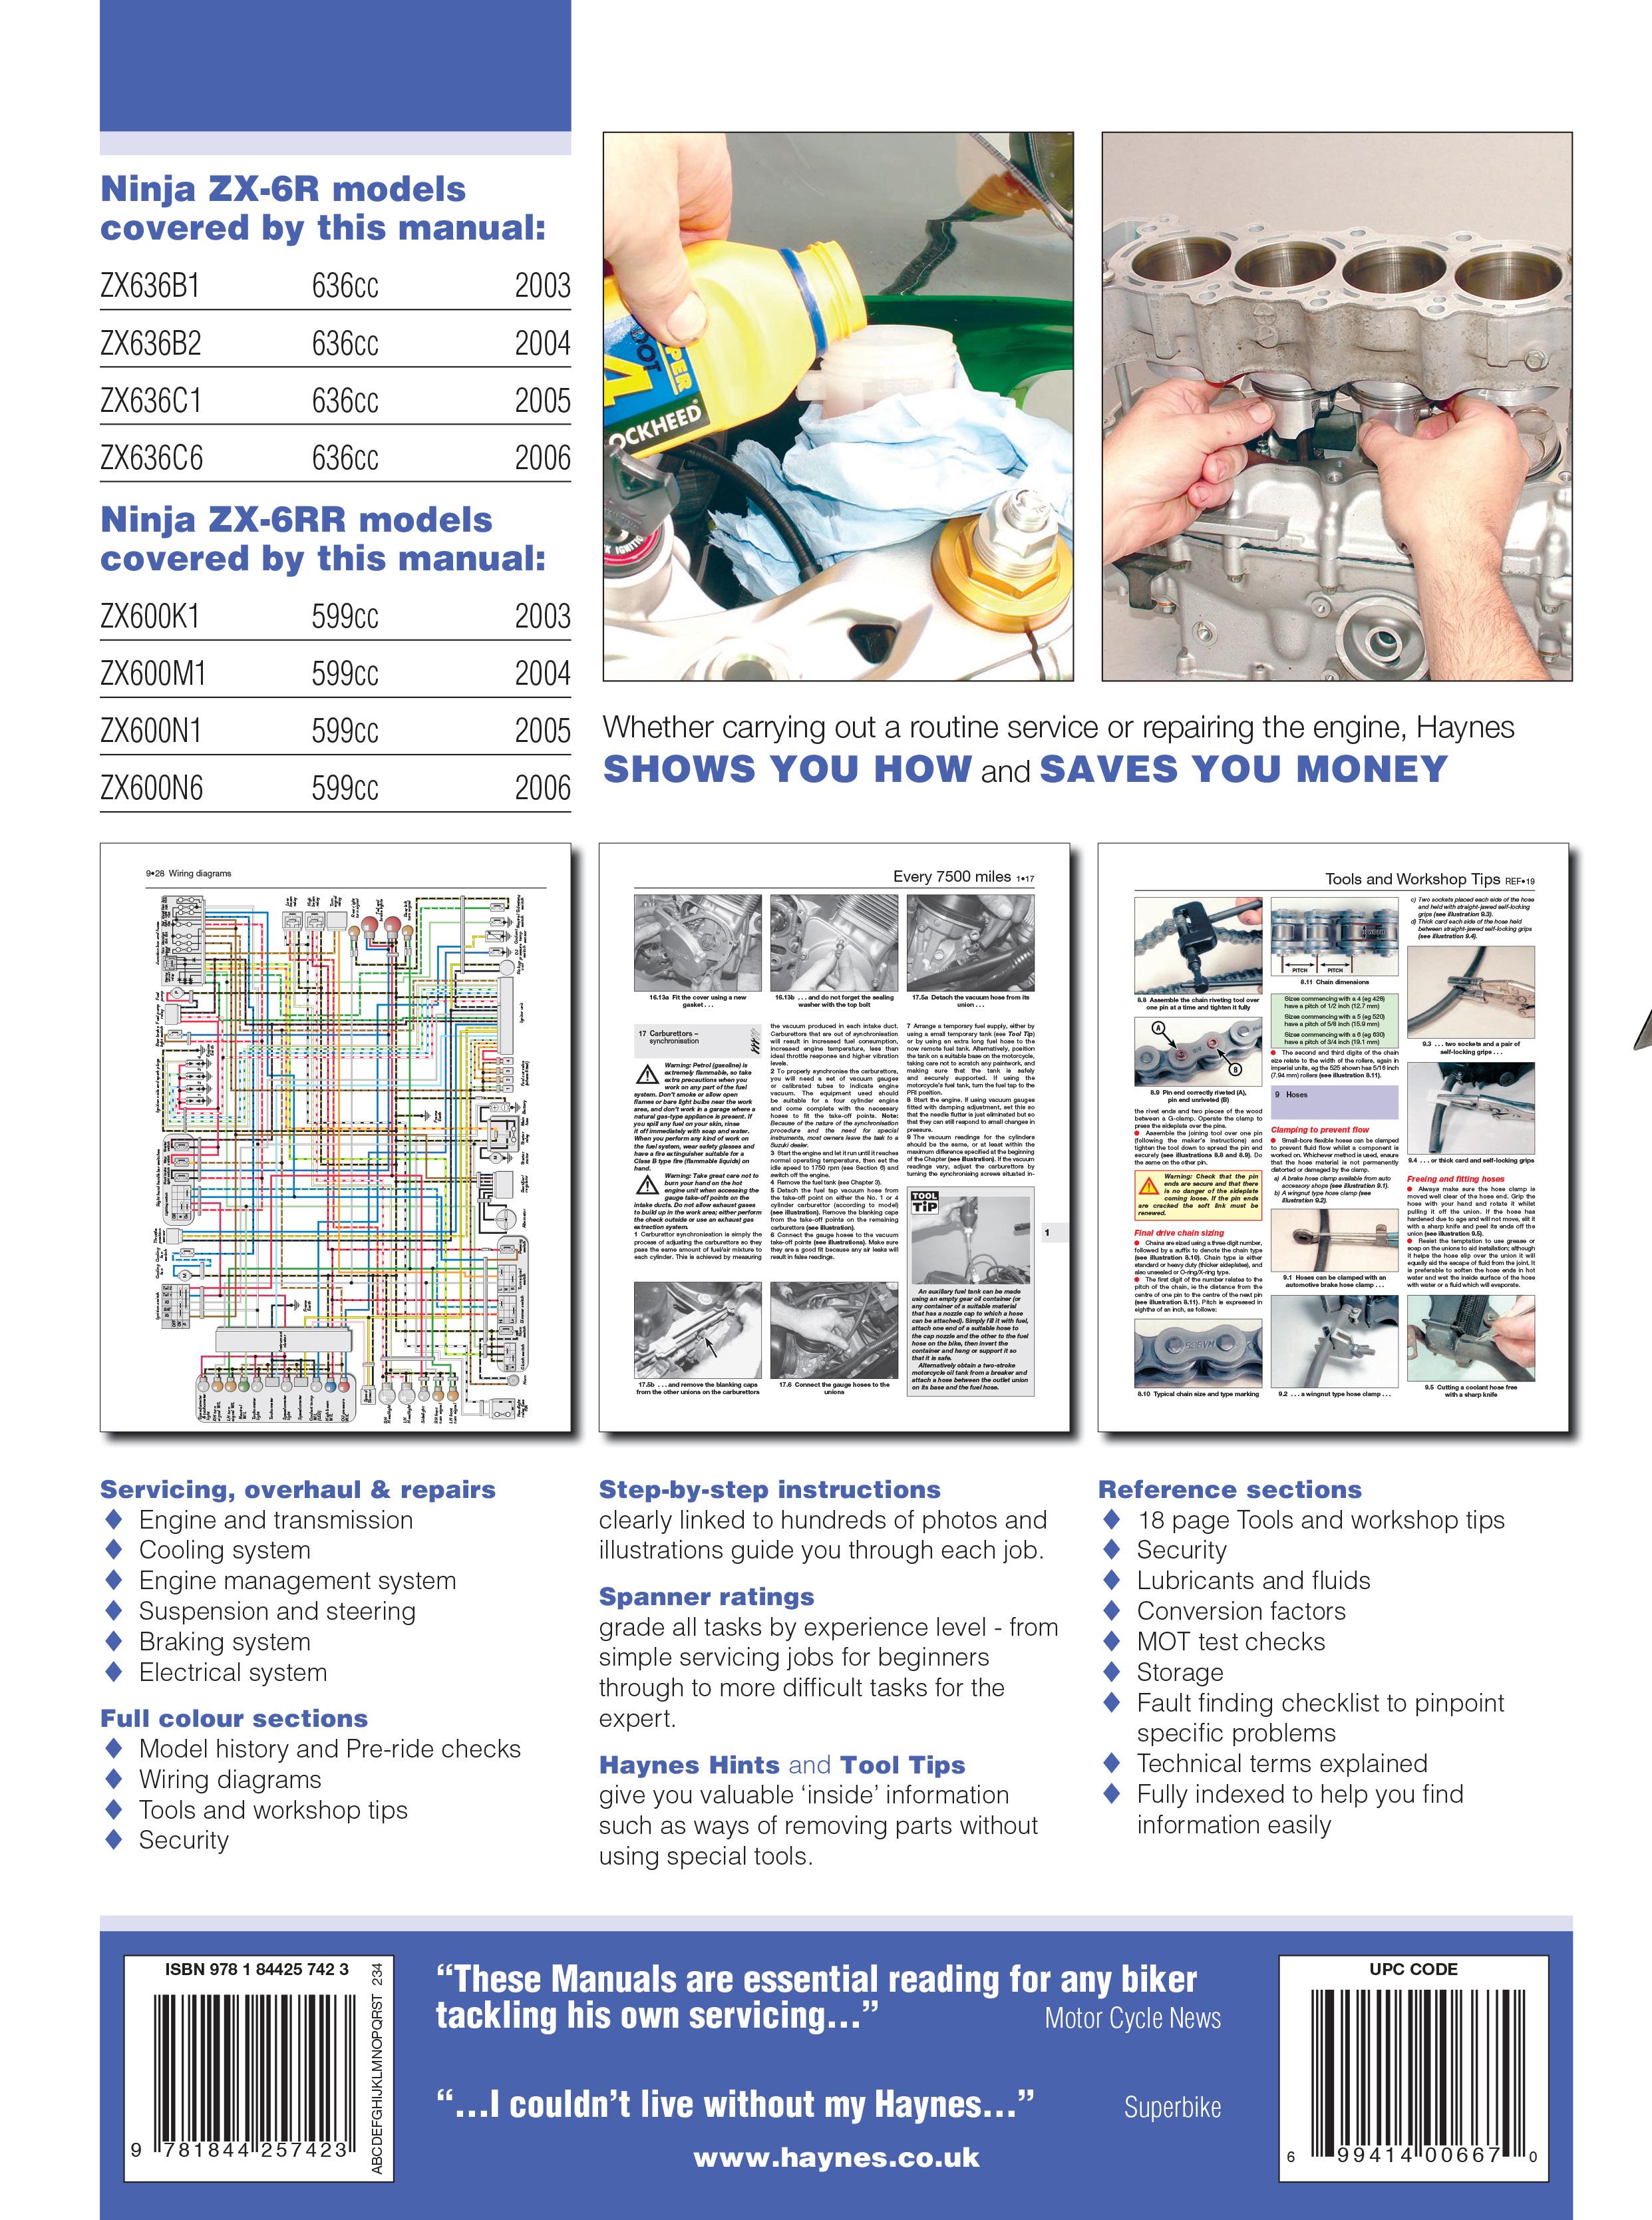 kawasaki ninja zx 6r & zx 6rr (03 06) haynes repair manual kawasaki 2003 636 wiring diagram kawasaki zx636